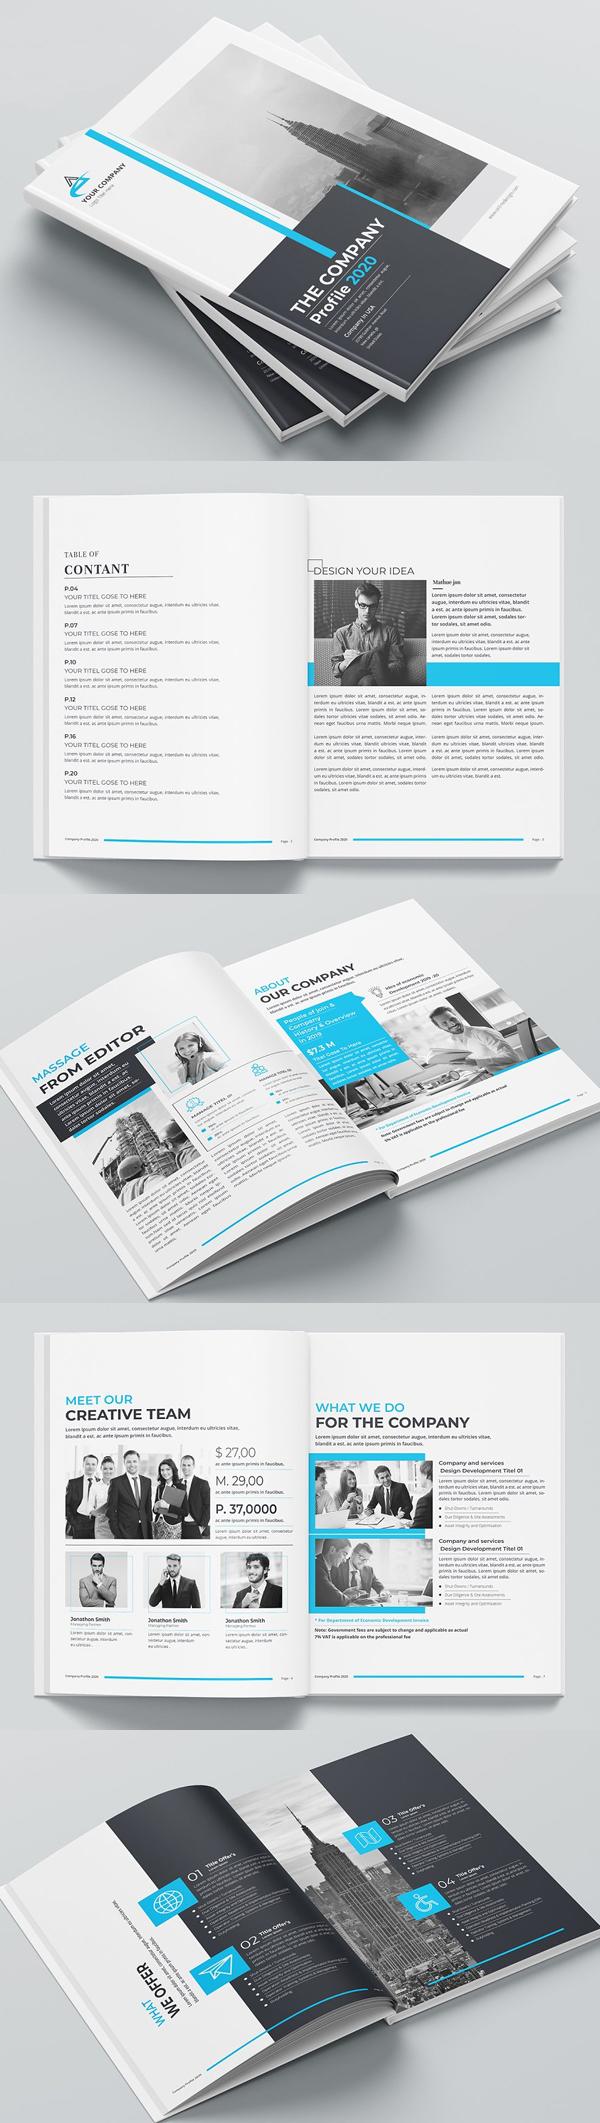 Awesome Company Profile Print Template